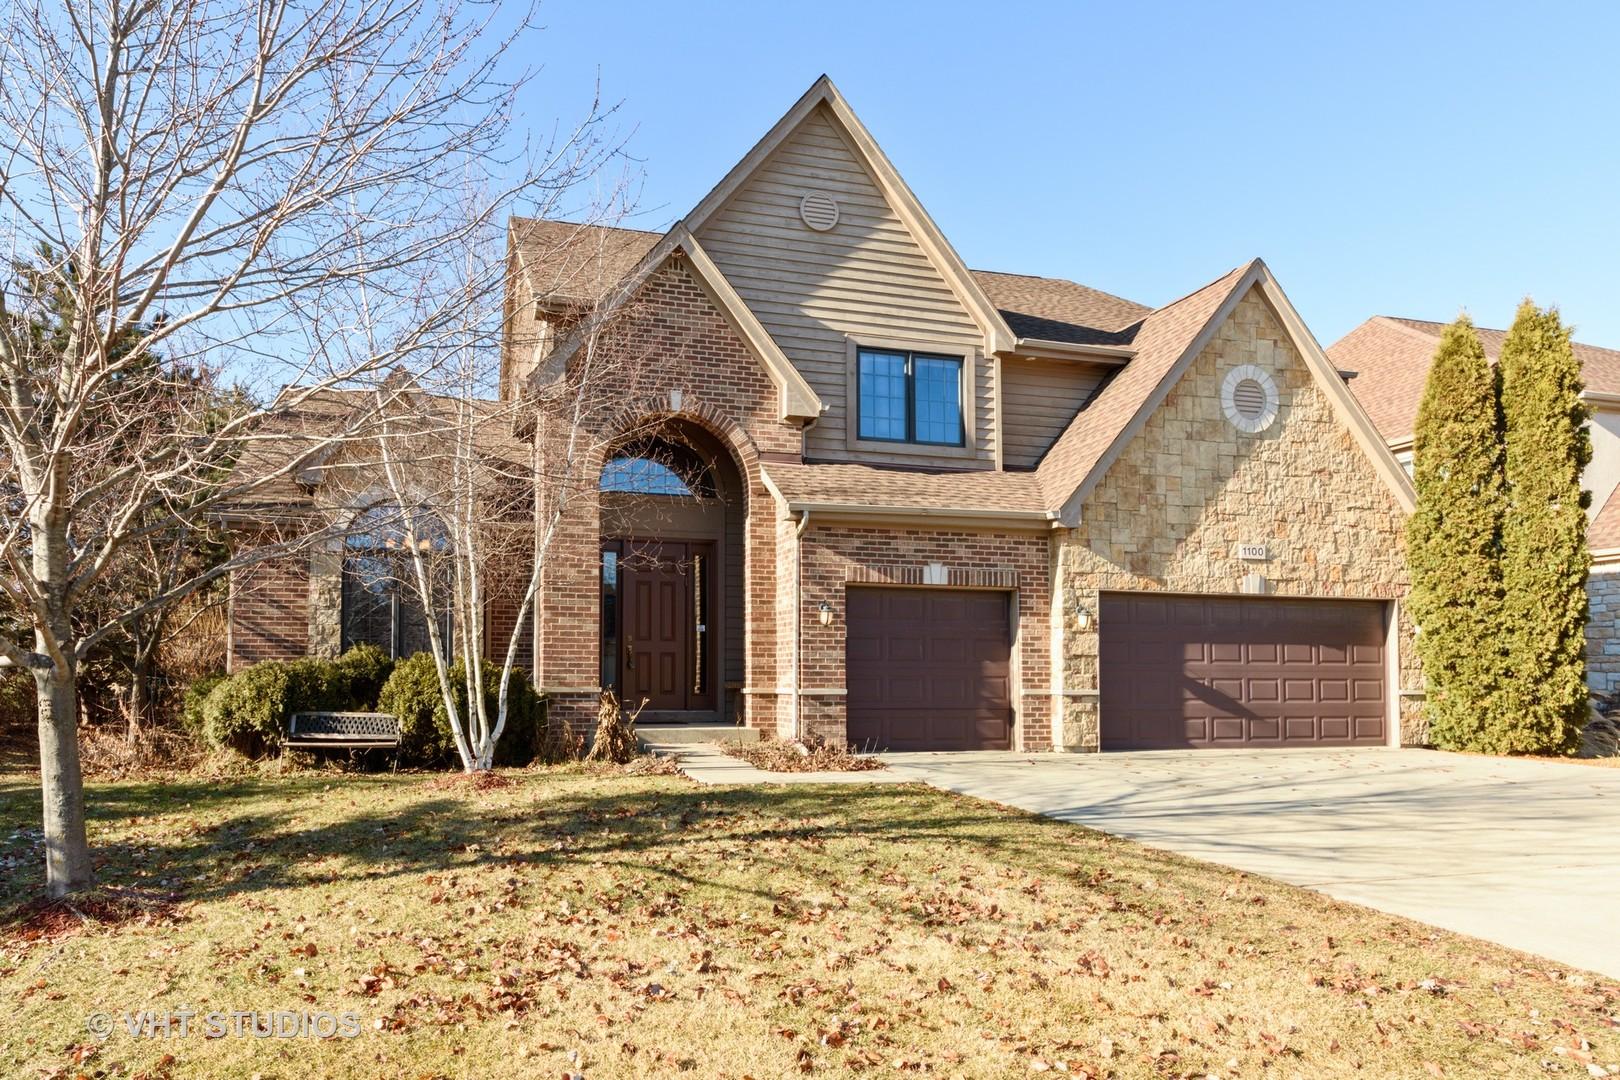 1100 Old Barn Road, Buffalo Grove, Illinois 60089